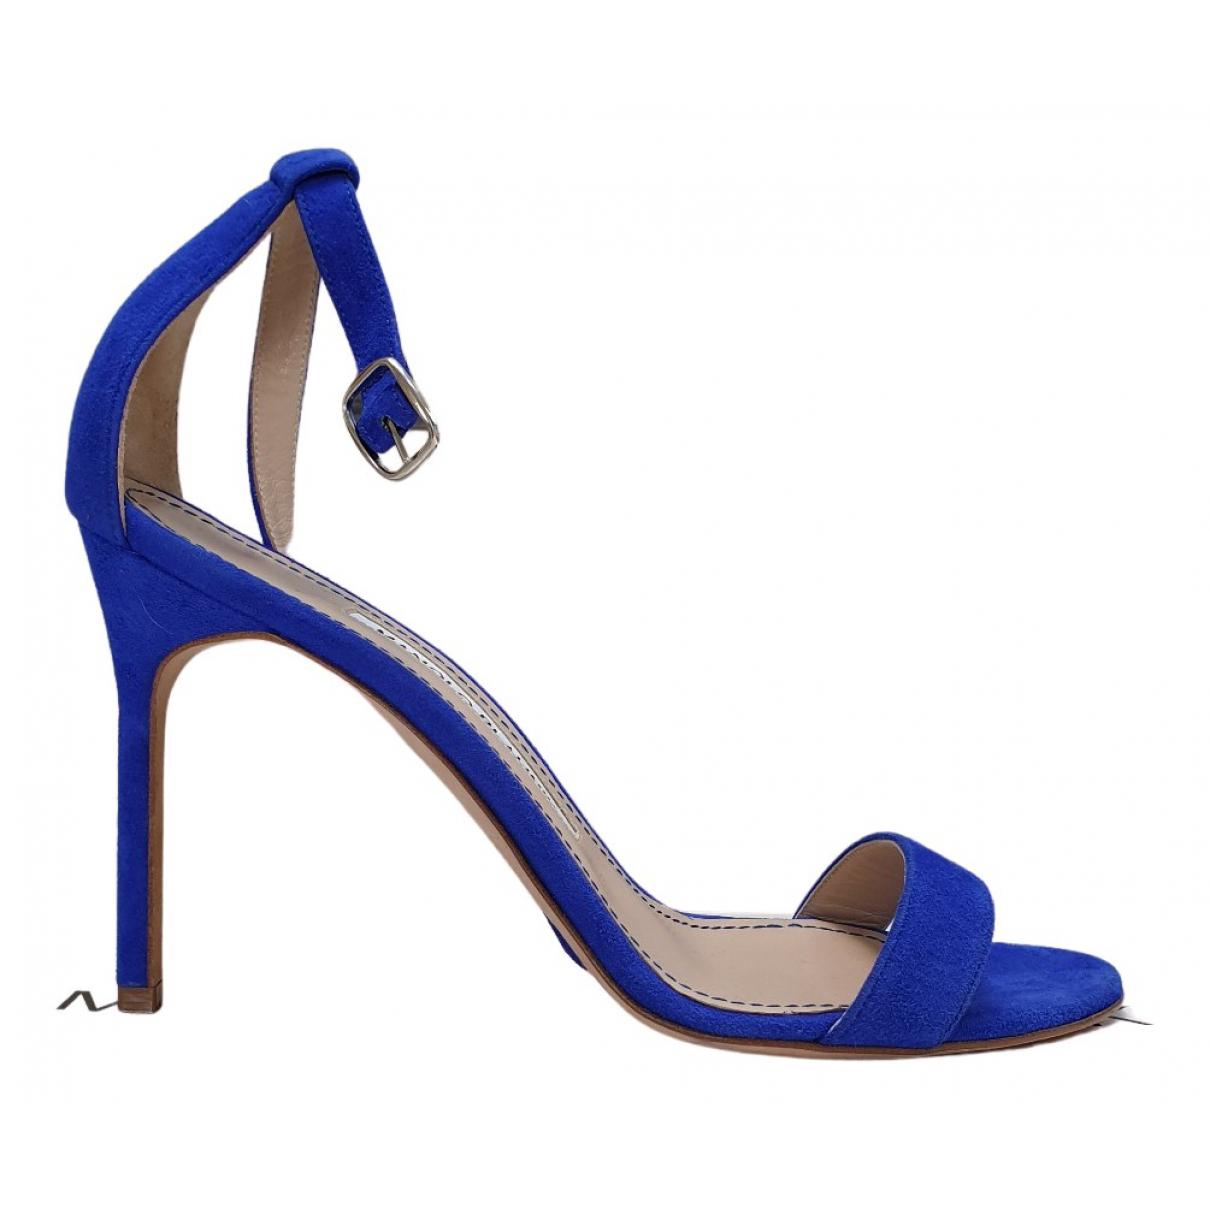 Manolo Blahnik \N Sandalen in  Blau Veloursleder